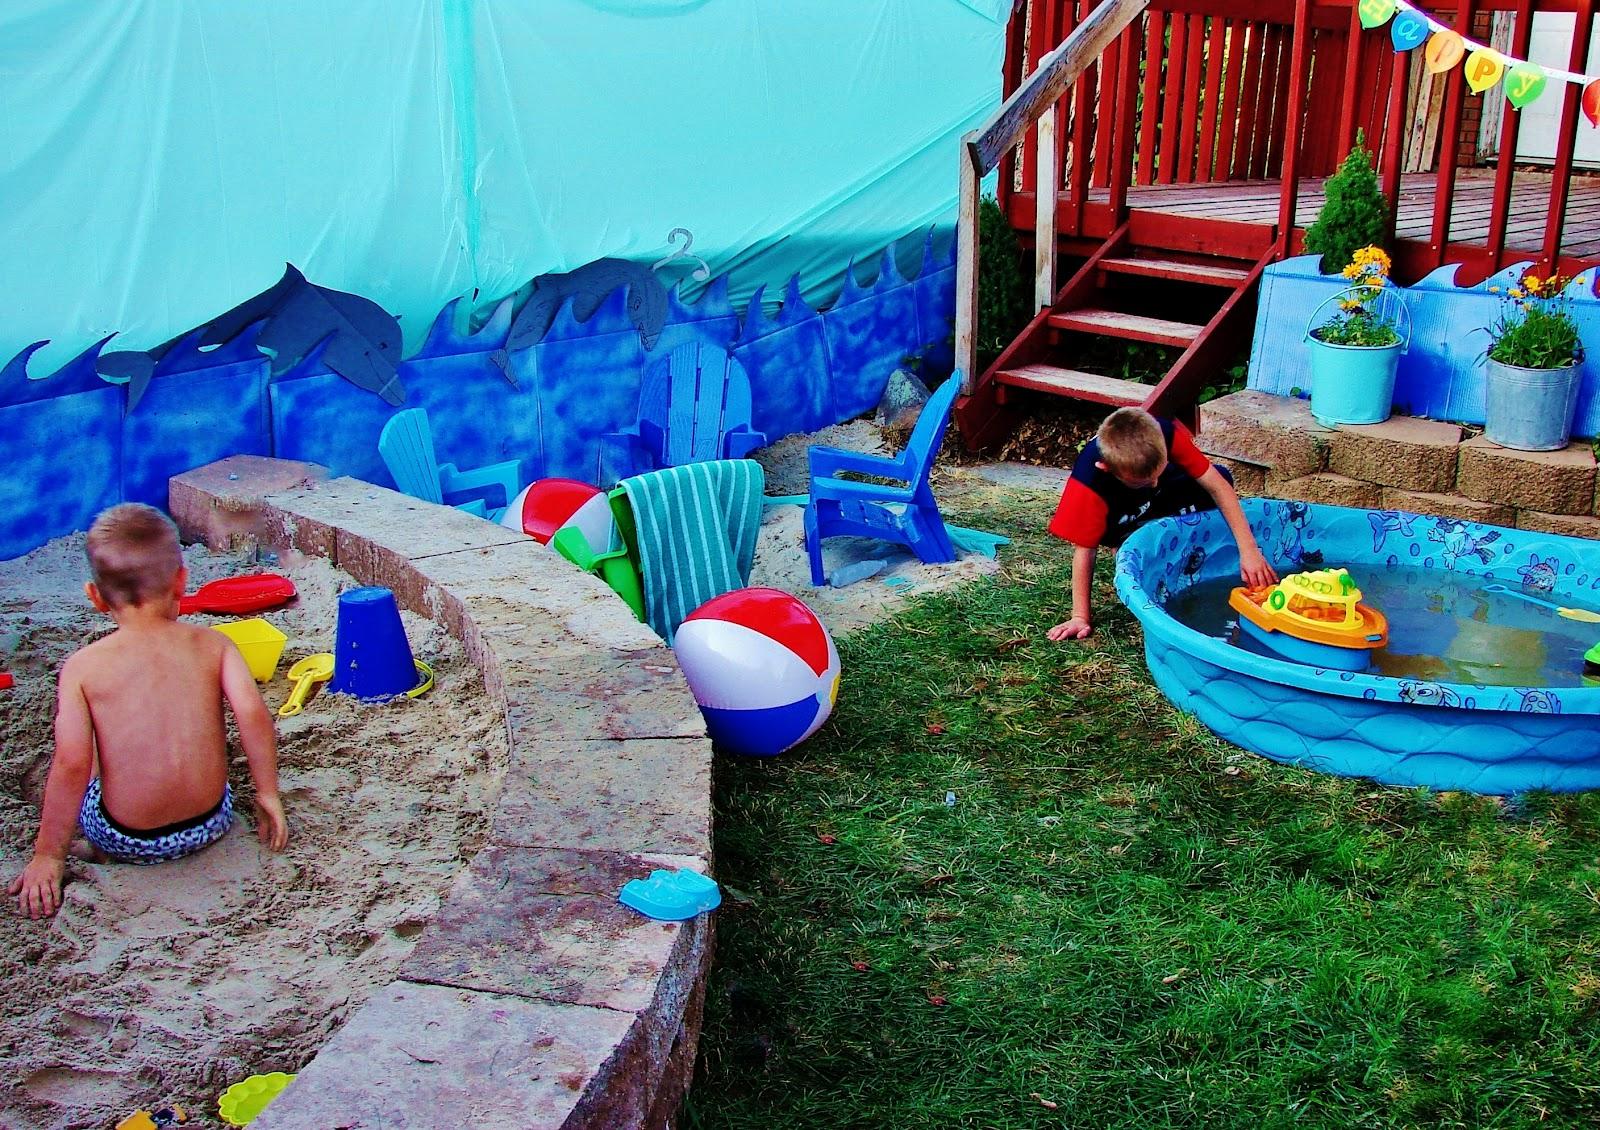 hearth  u0026 holm  picnic at the  u0026quot beach u0026quot  birthday party